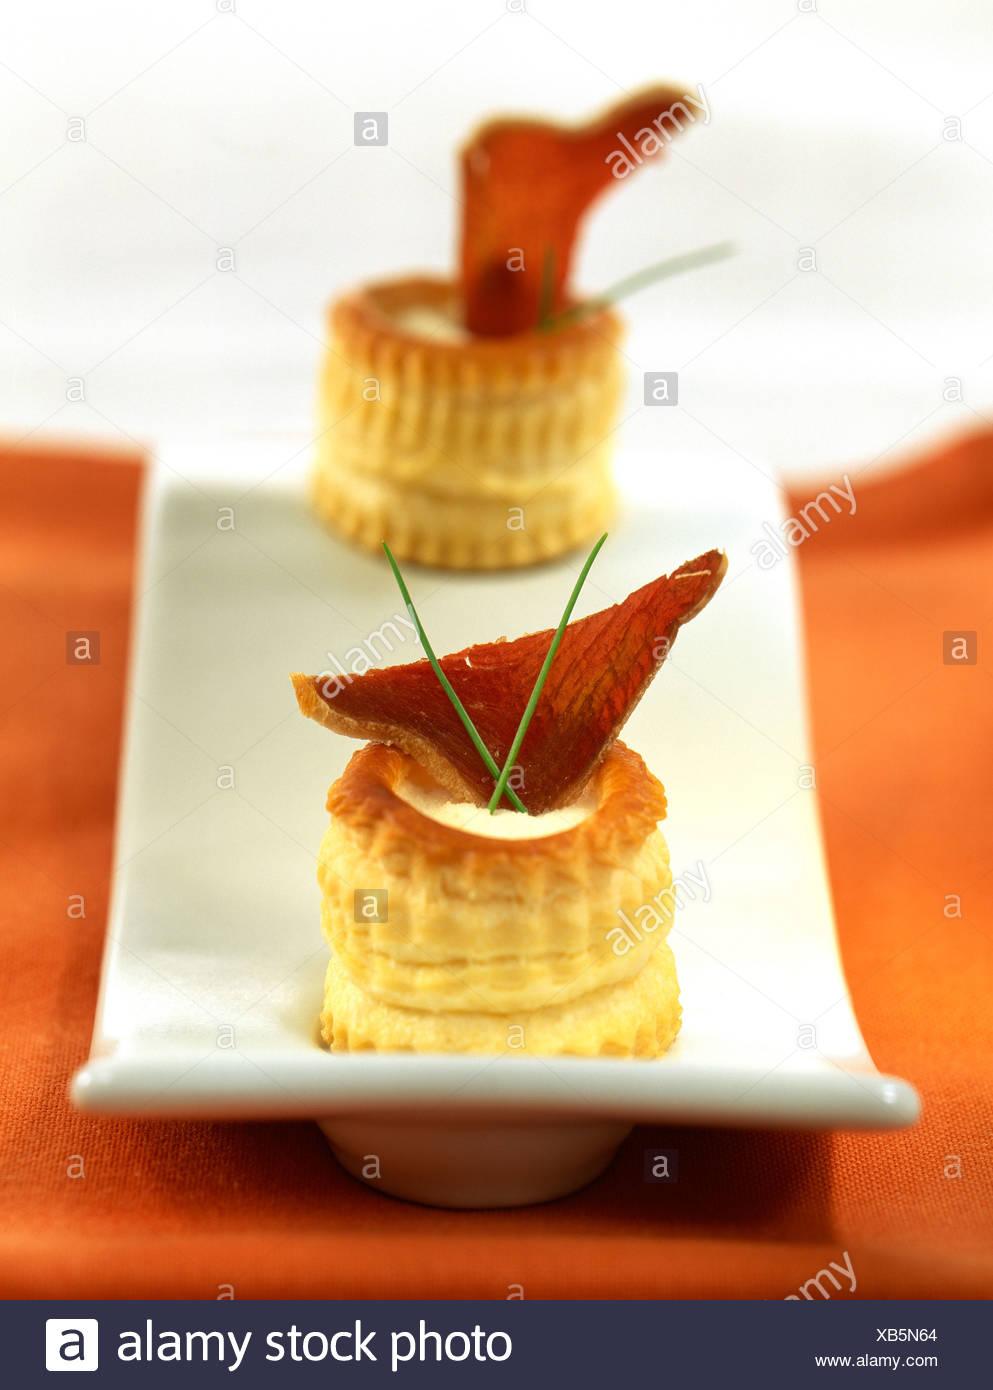 Salmon vol-au-vent and pureed almonds Stock Photo